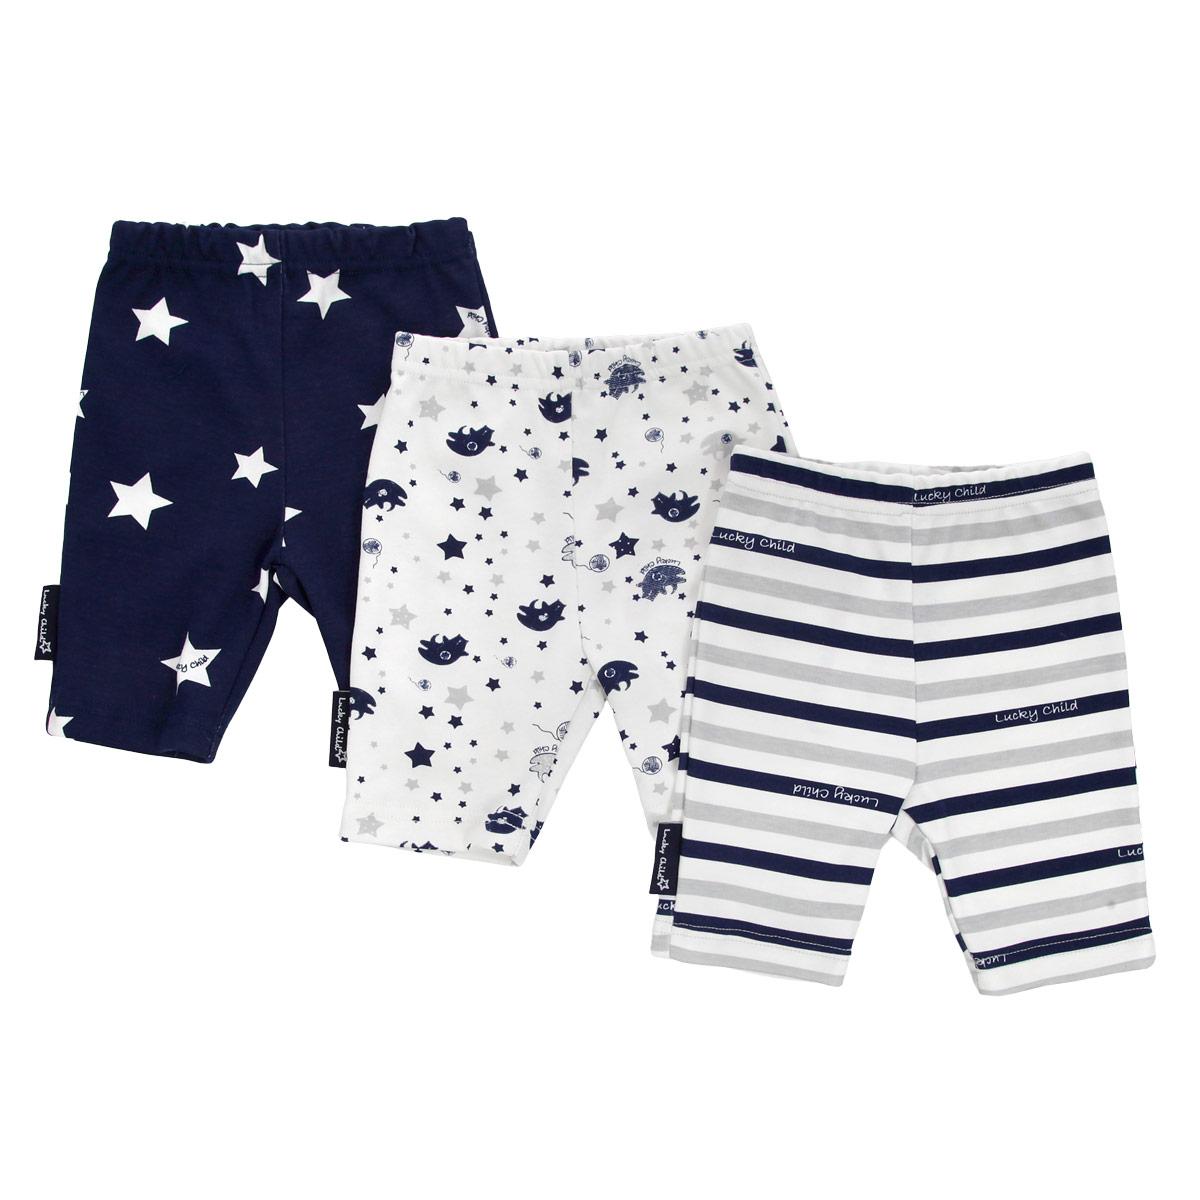 Шорты детские Lucky Child Котики, цвет: синий, белый, серый, 3 шт. 30-160. Размер 74/80 lucky child 3 шт котики